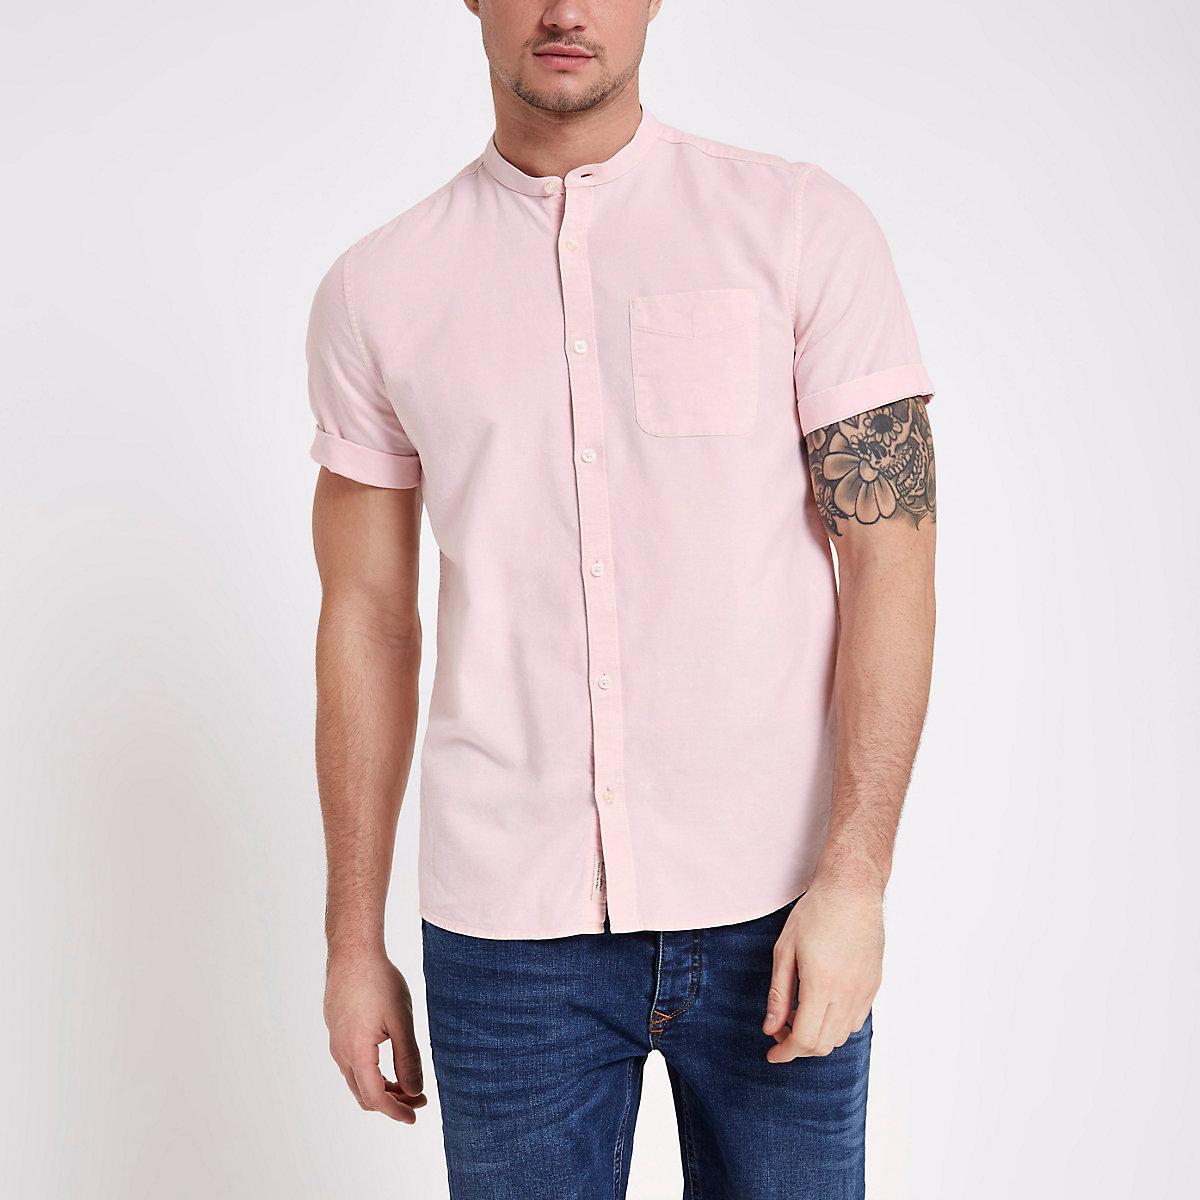 Pink acid wash grandad collar Oxford shirt